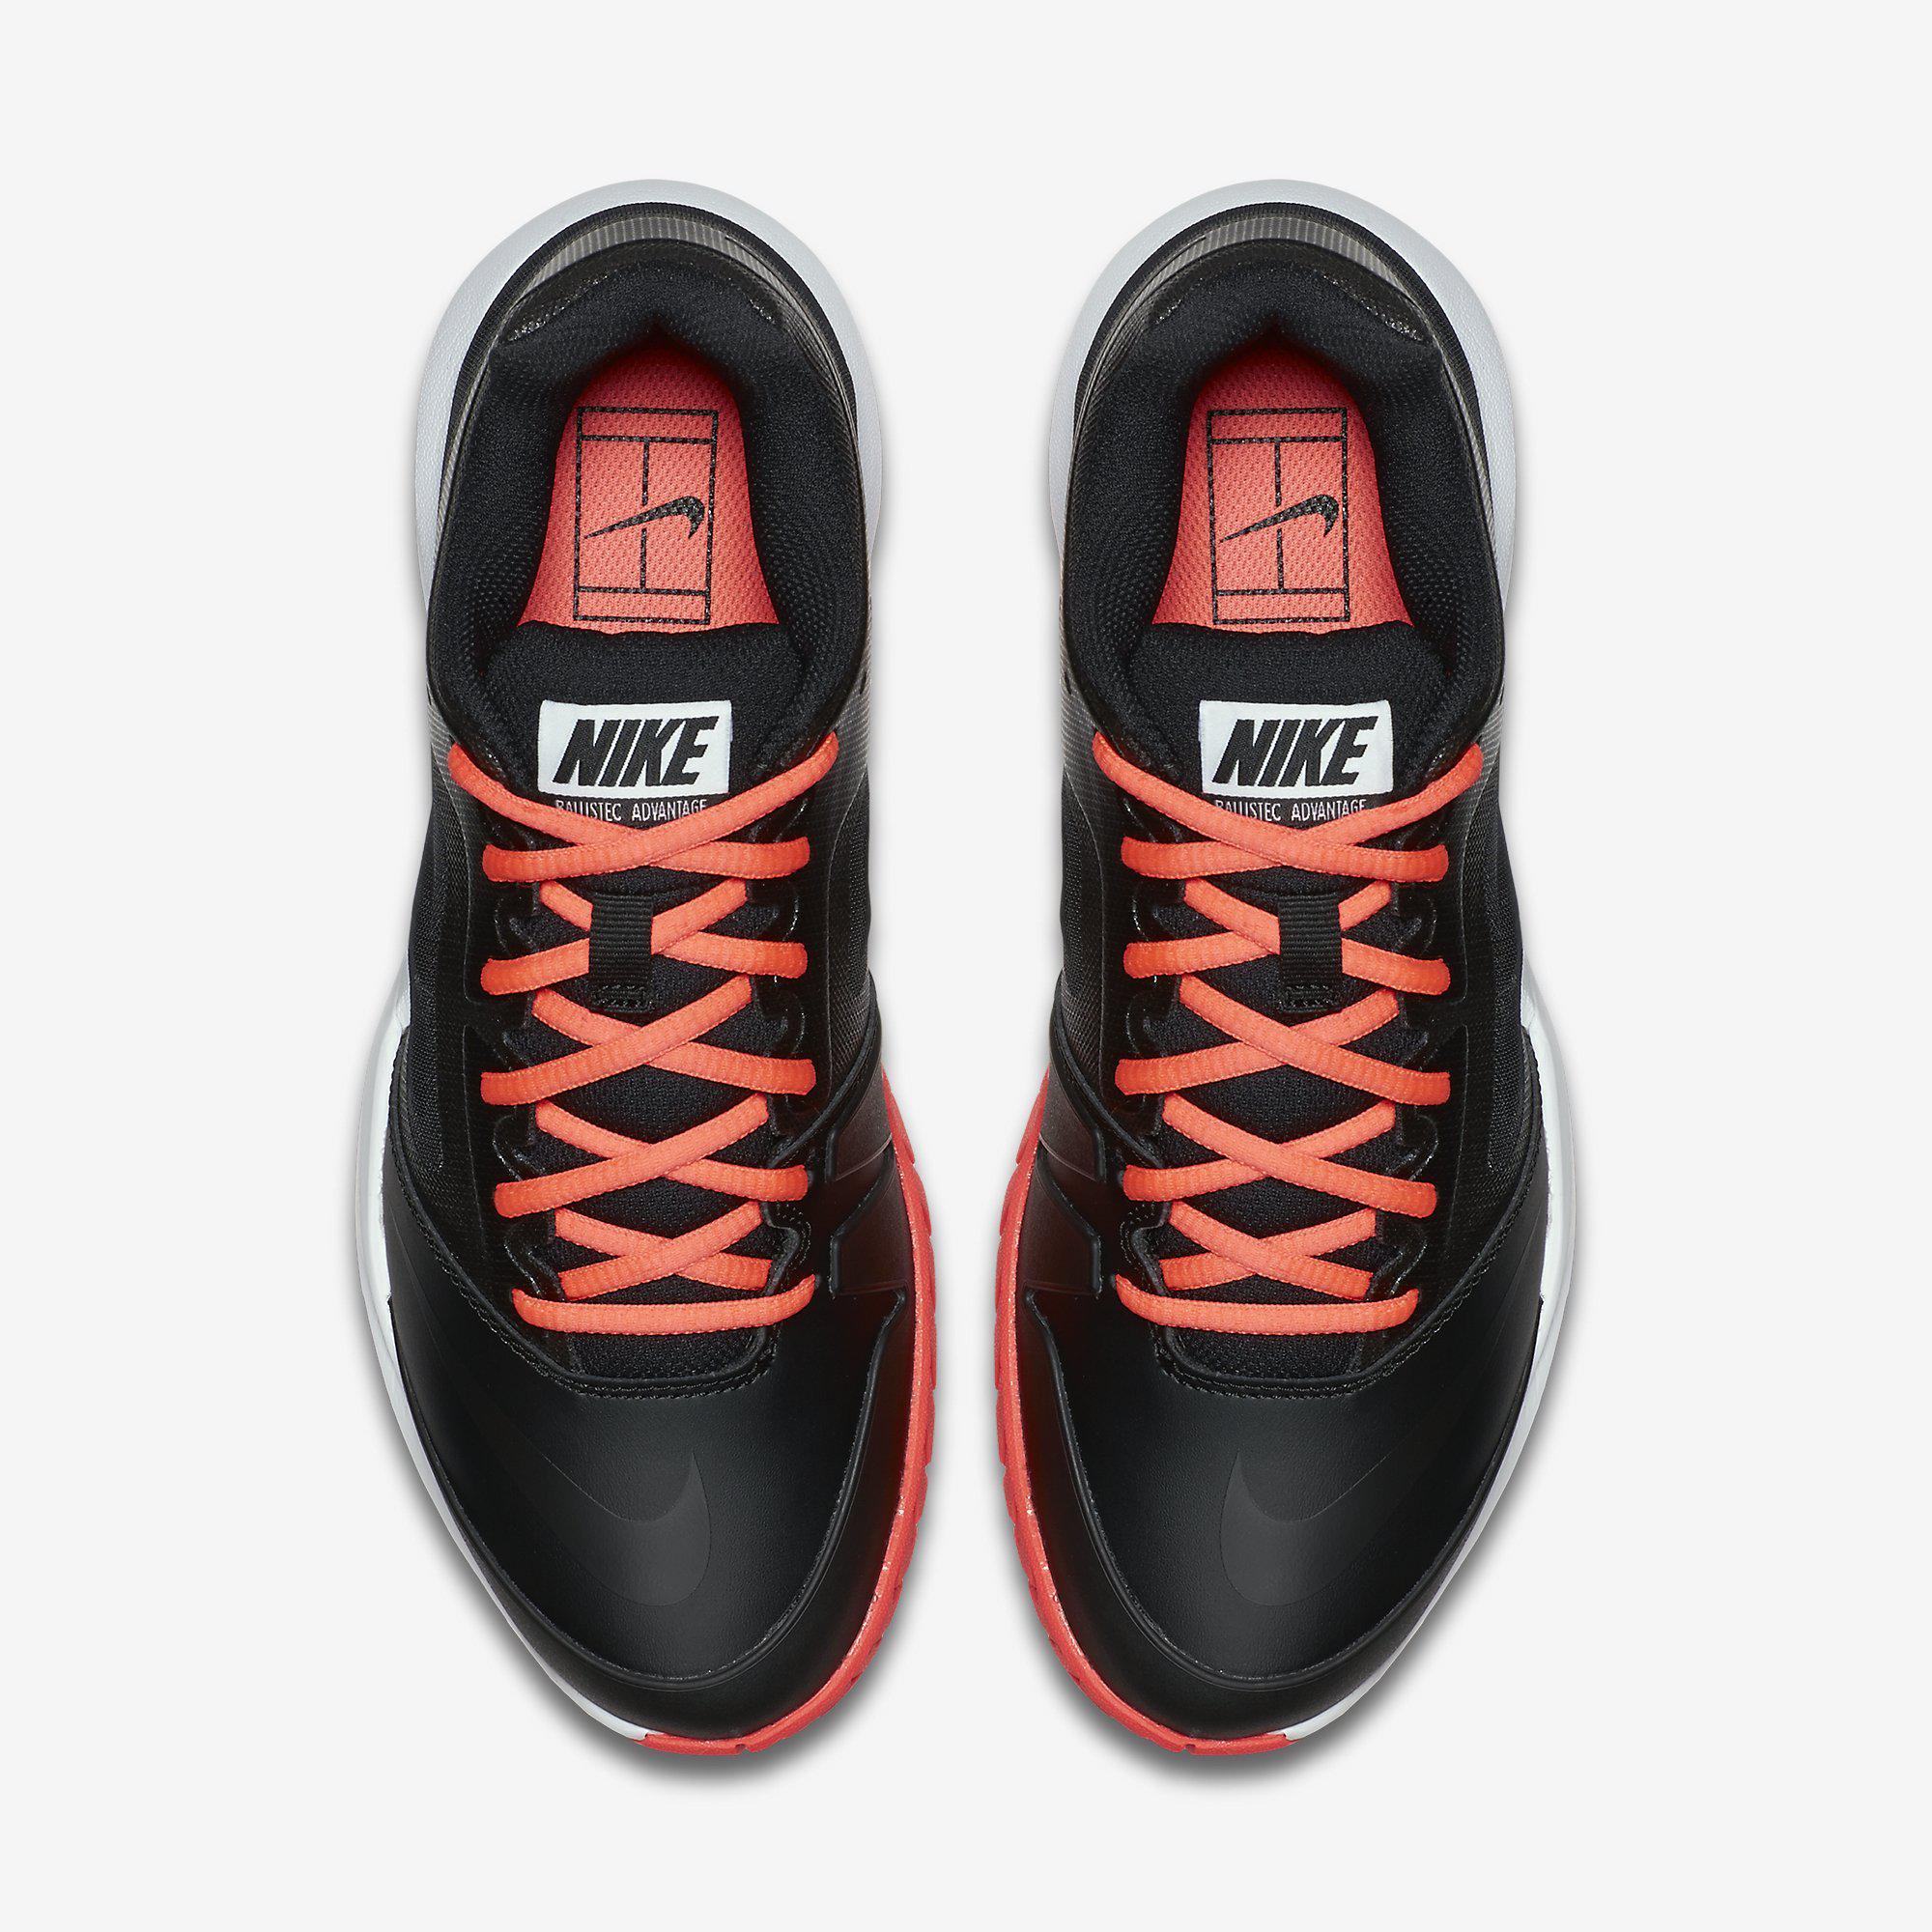 huge discount fc508 2f44a Nike Womens Dual Fusion Ballistec Advantage Tennis Shoes - Black Hot Lava